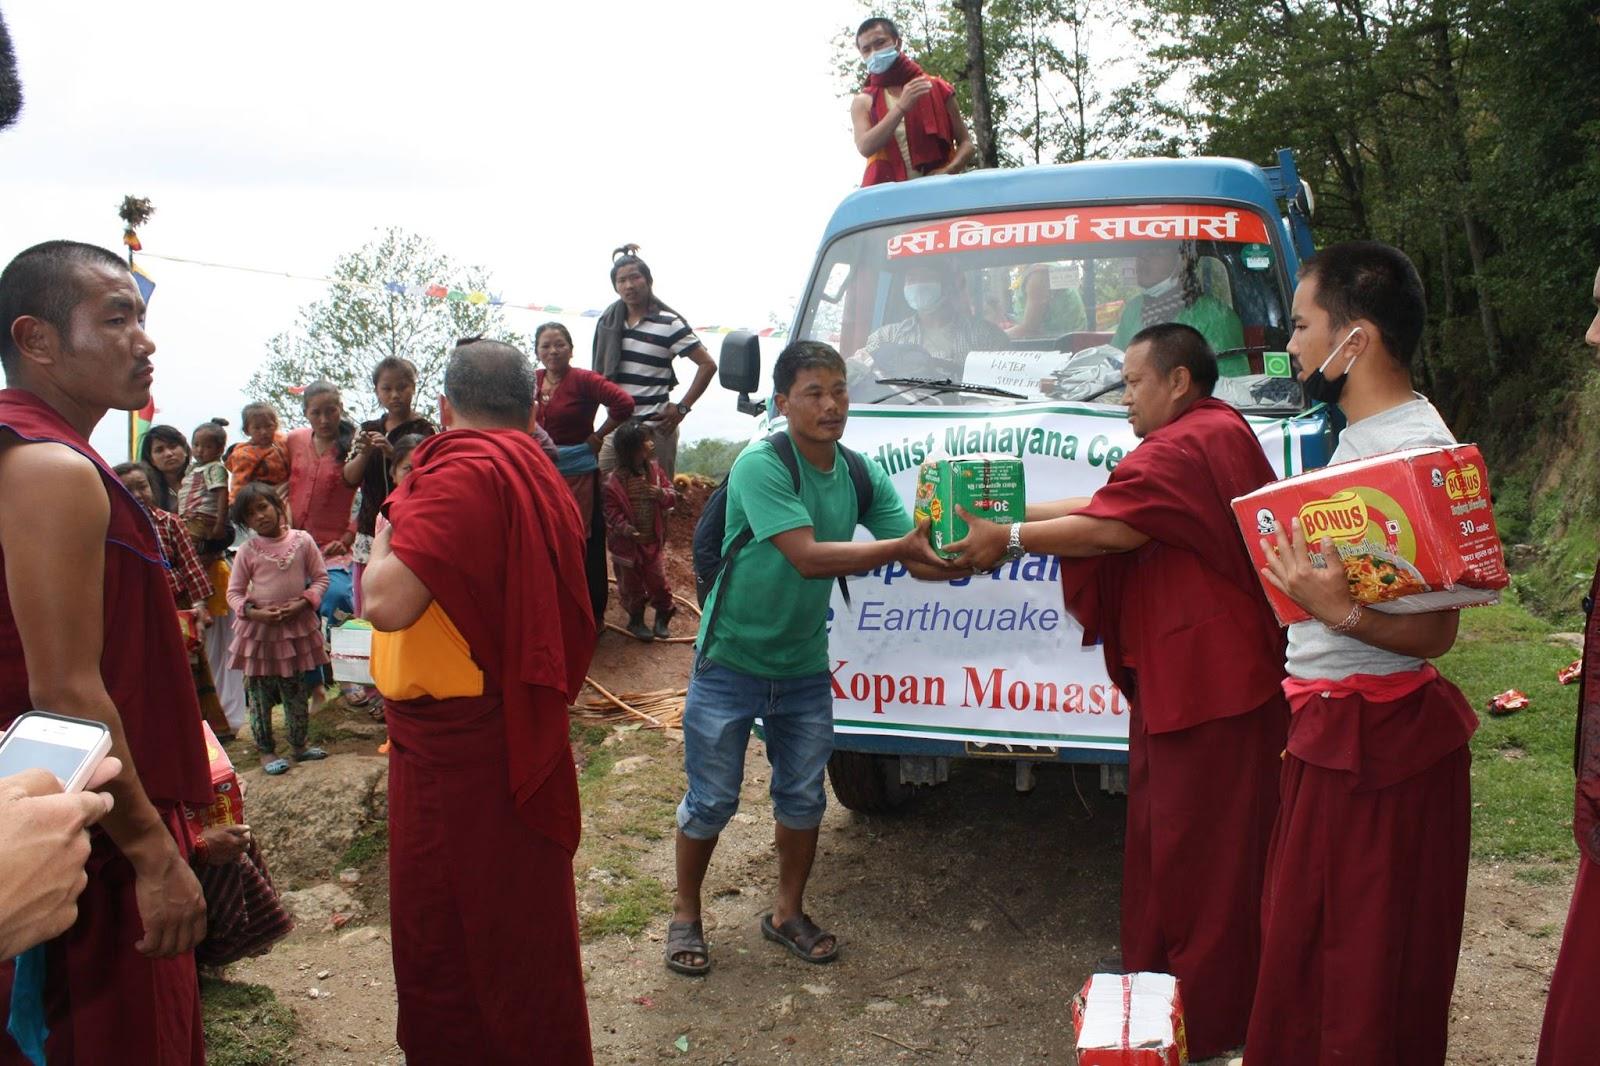 Kopan Helping Hands distributes essential food supplies to villagers in need.